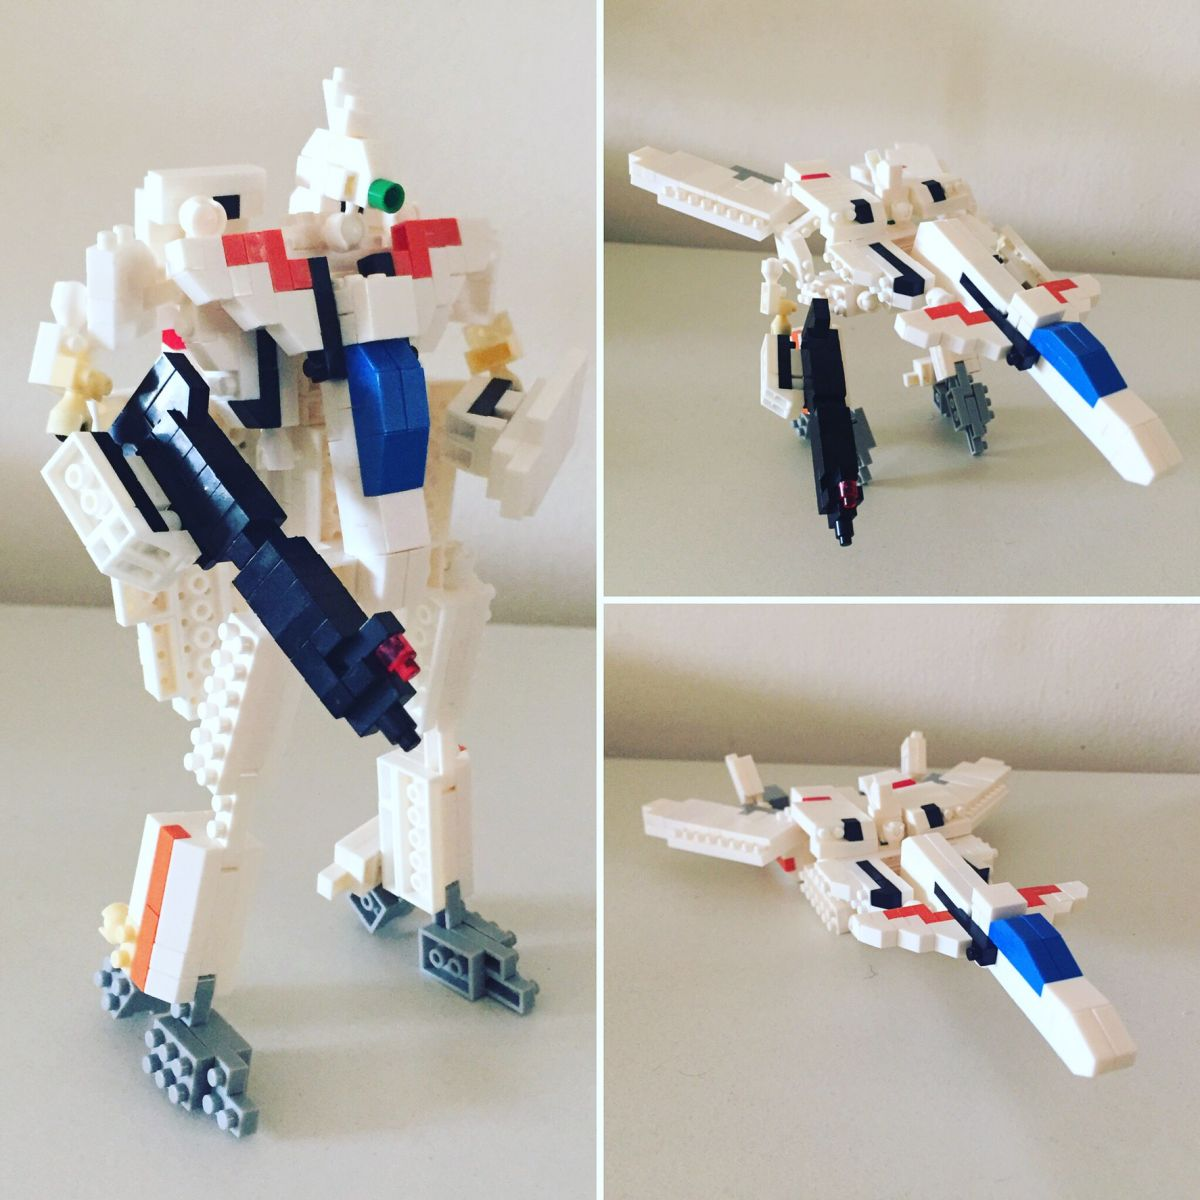 Nanoblock VF-11